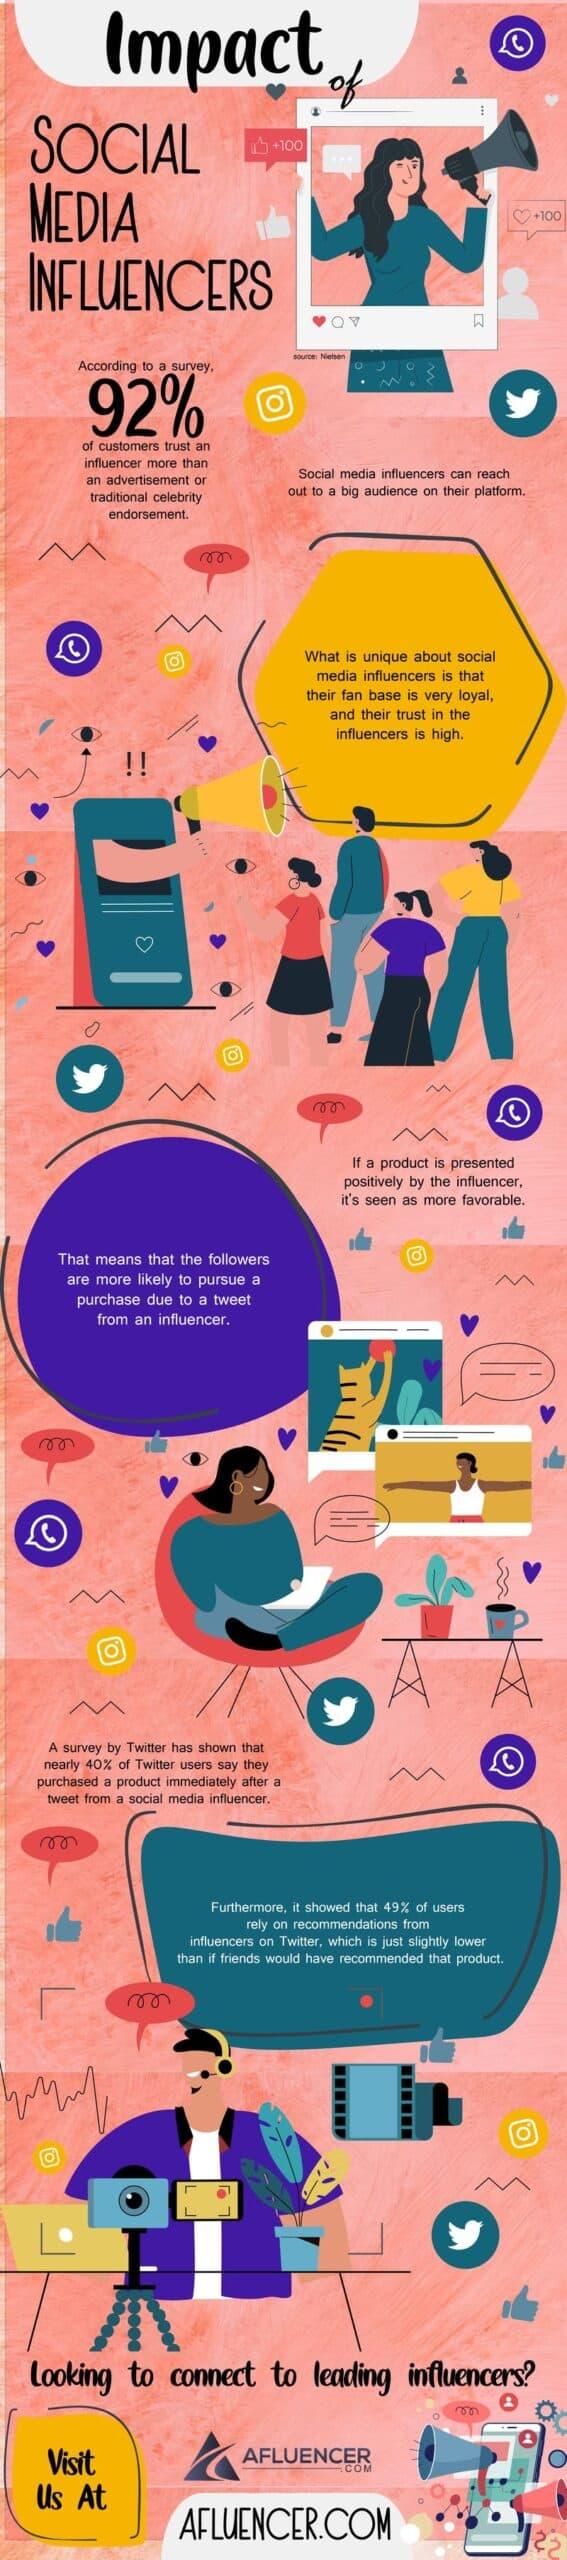 Impact Of Social Media Influencers